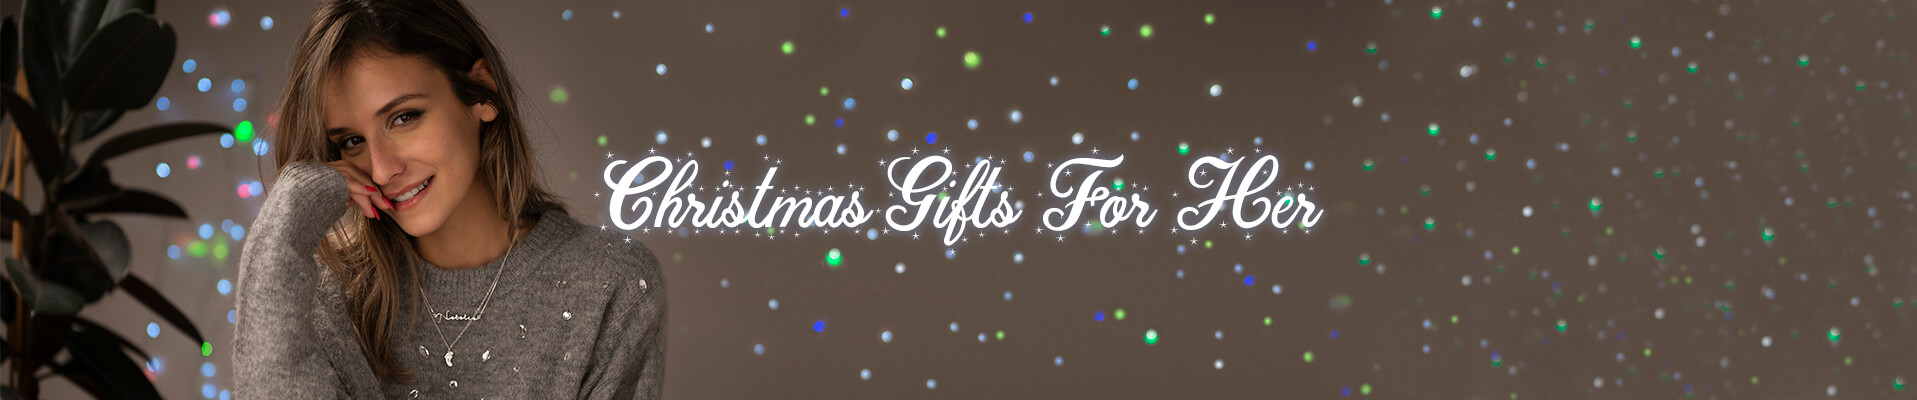 Christmas gifts for her desktop banner